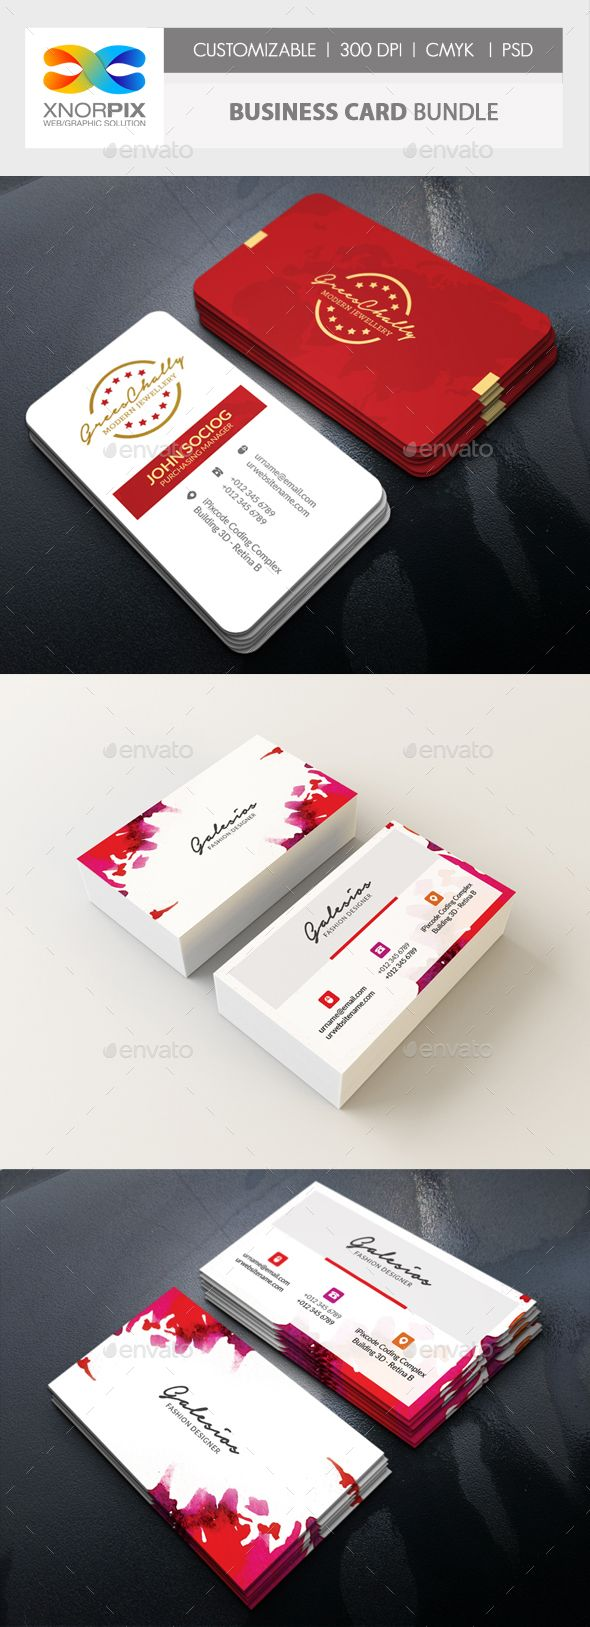 #Business #Card #Bundle - Corporate Business Cards Download here: https://graphicriver.net/item/business-card-bundle/20057836?ref=alena994